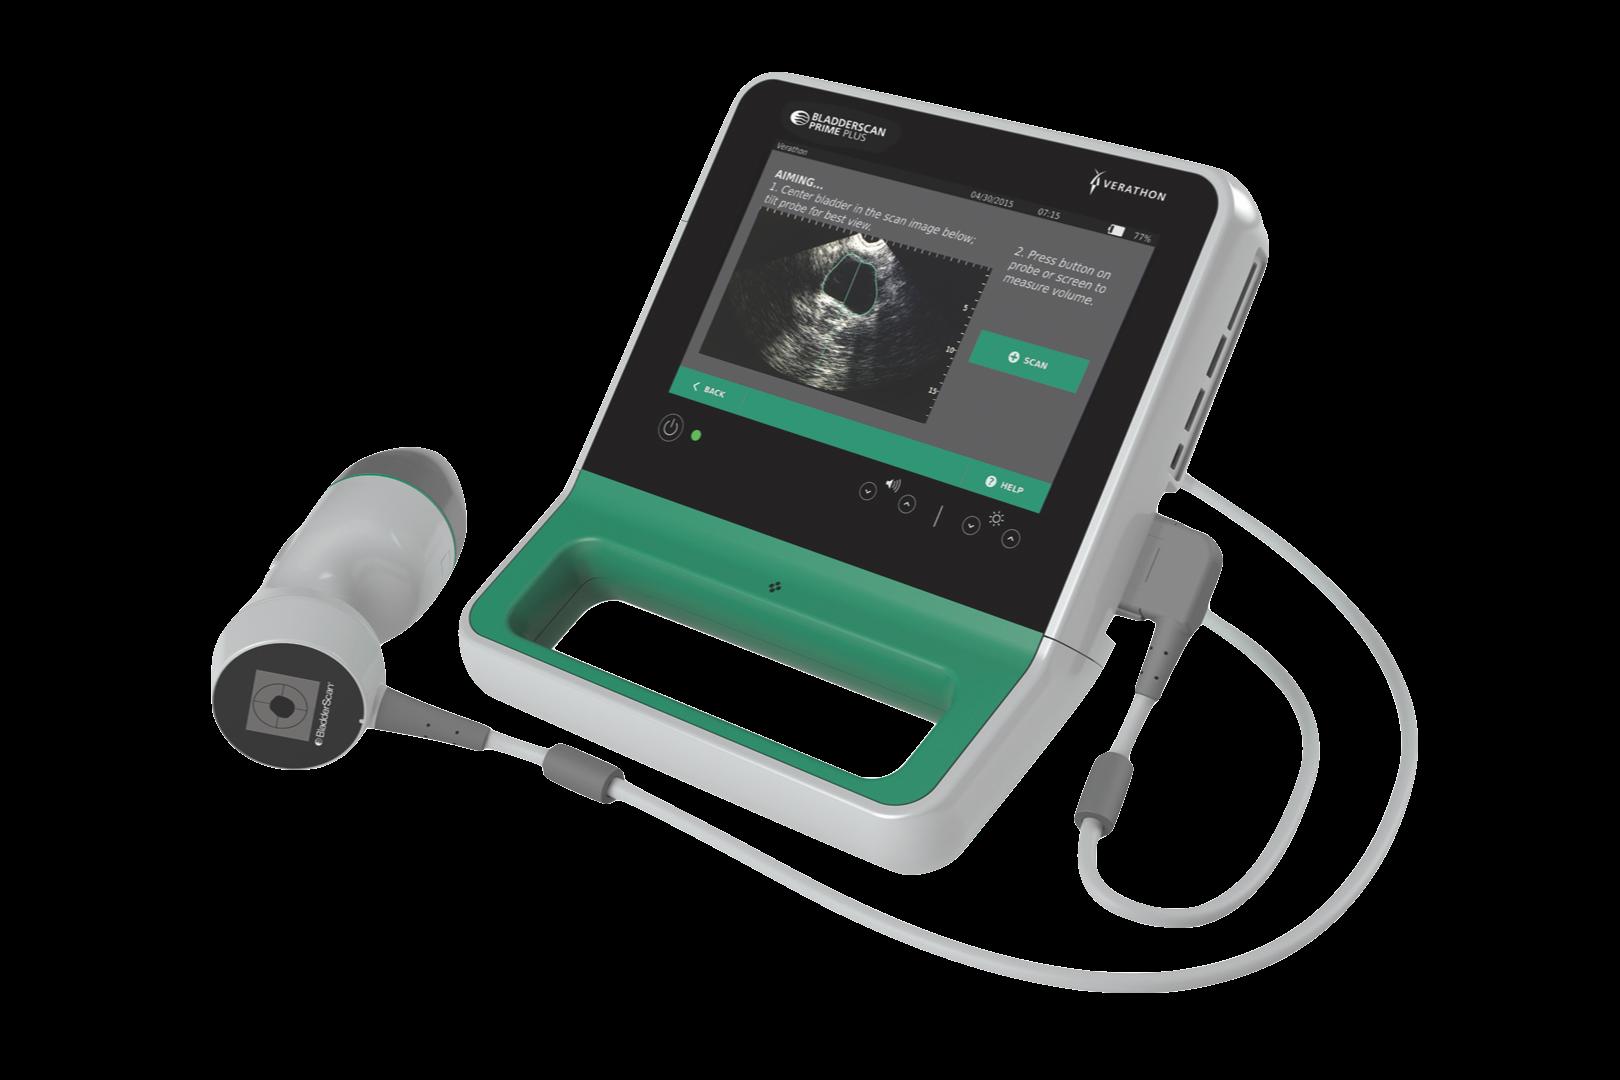 Instrument de mesure du volume vésical VERATHON BladderScan Prime